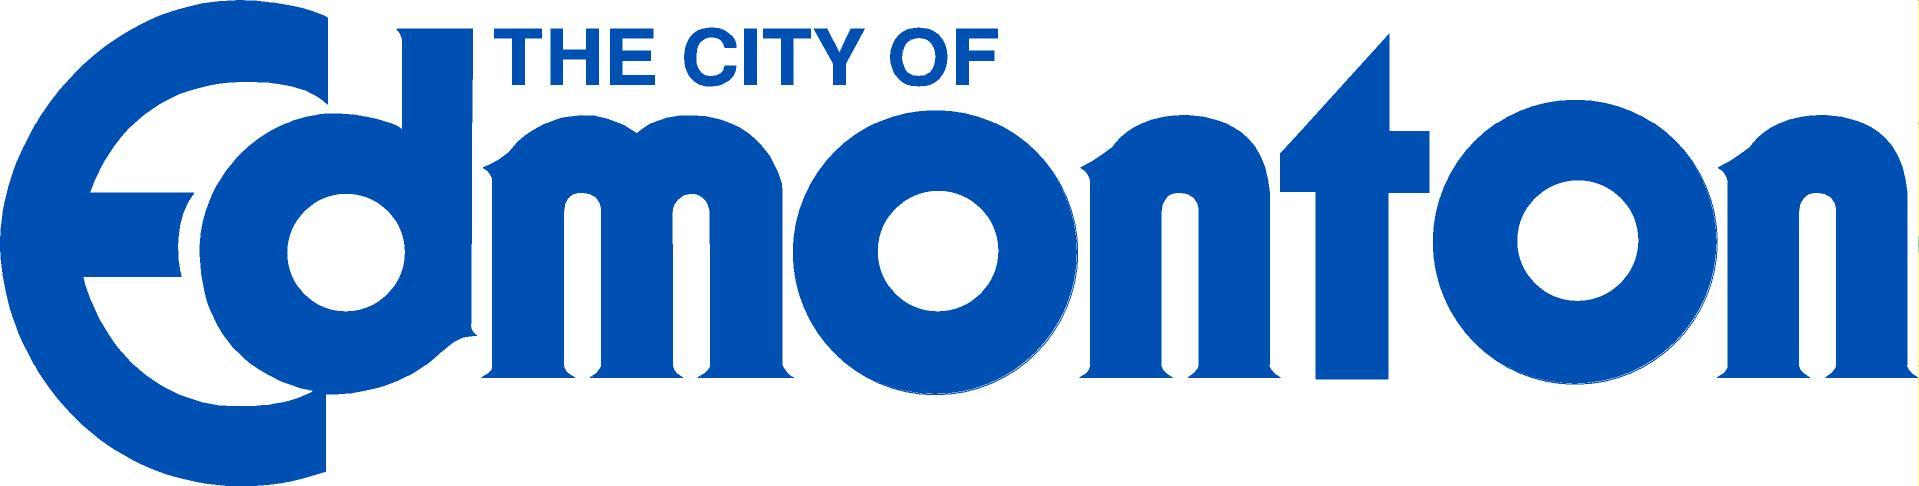 Edmonton-City-Gold.jpg